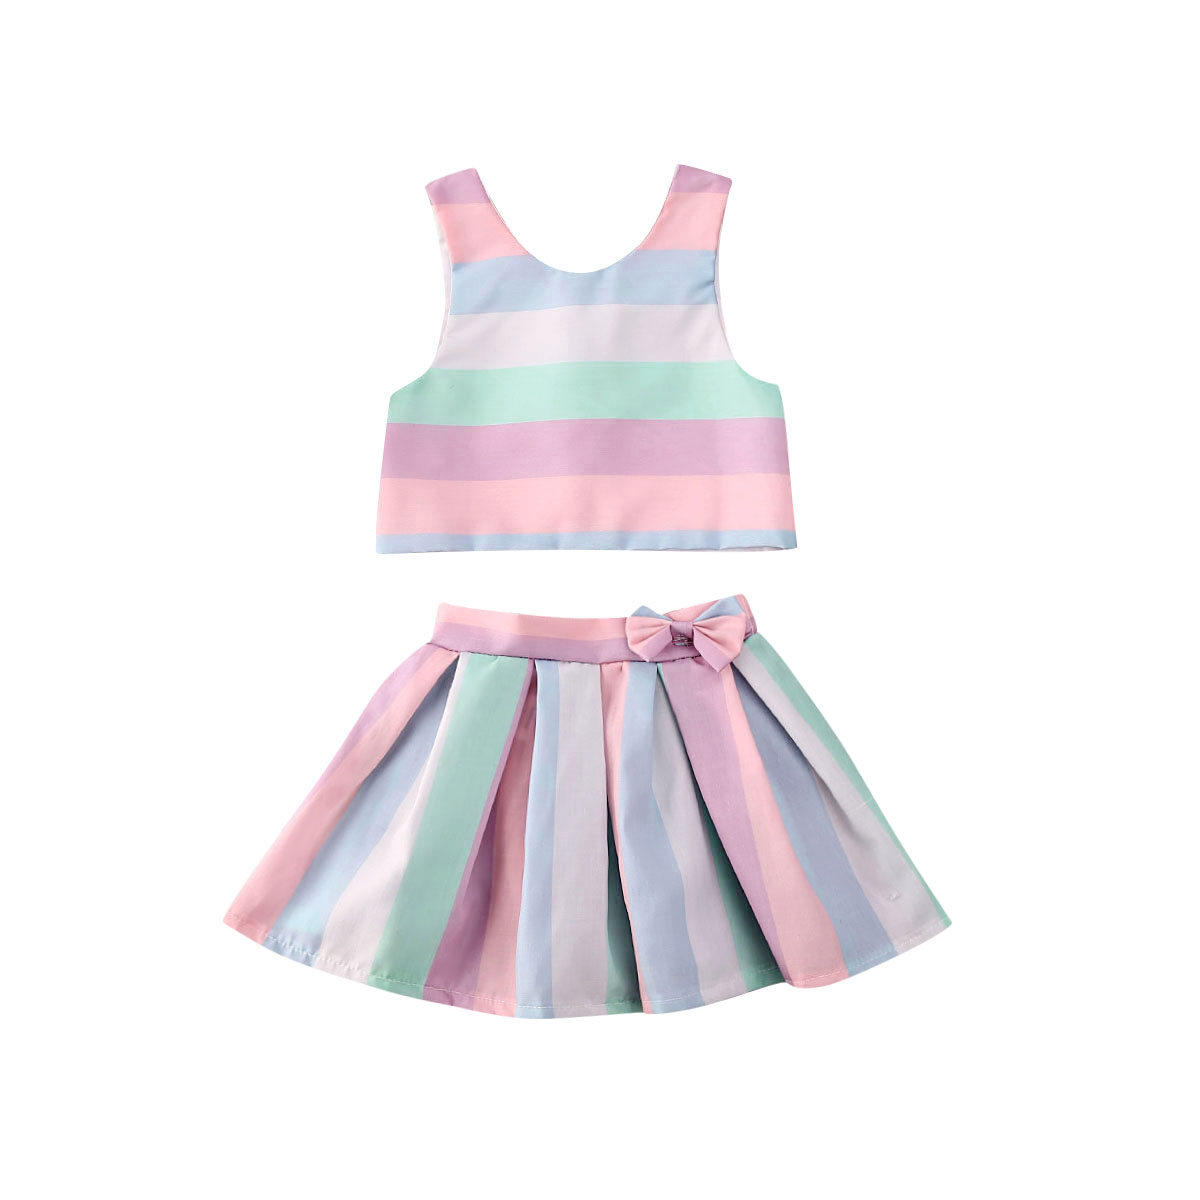 UK Toddler Kids Baby Girls Dress Cartoon Ice-Cream Printed Casual Dress 2-7Y